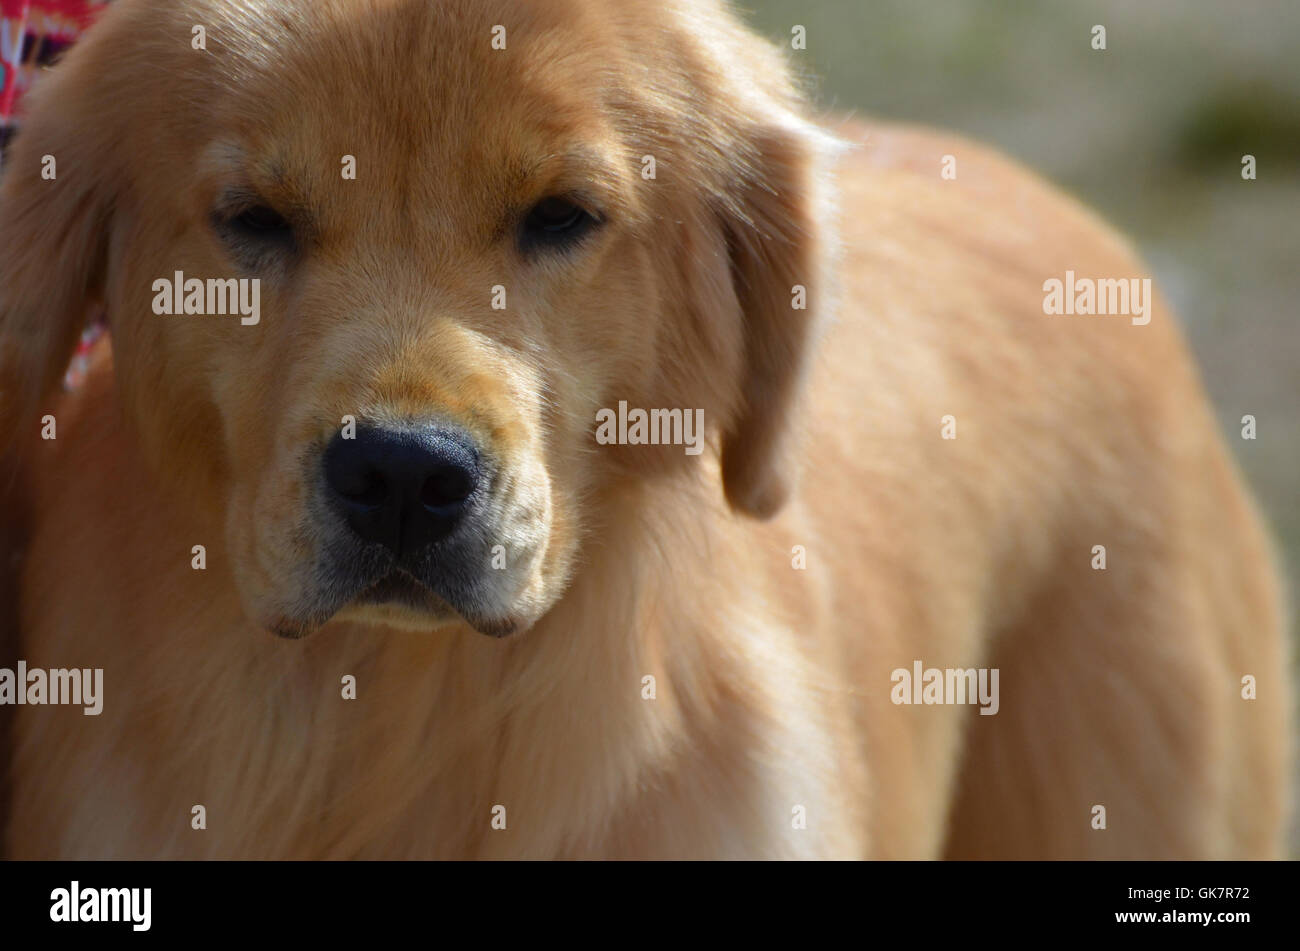 Beautiful sweet faced golden retriever puppy. Stock Photo